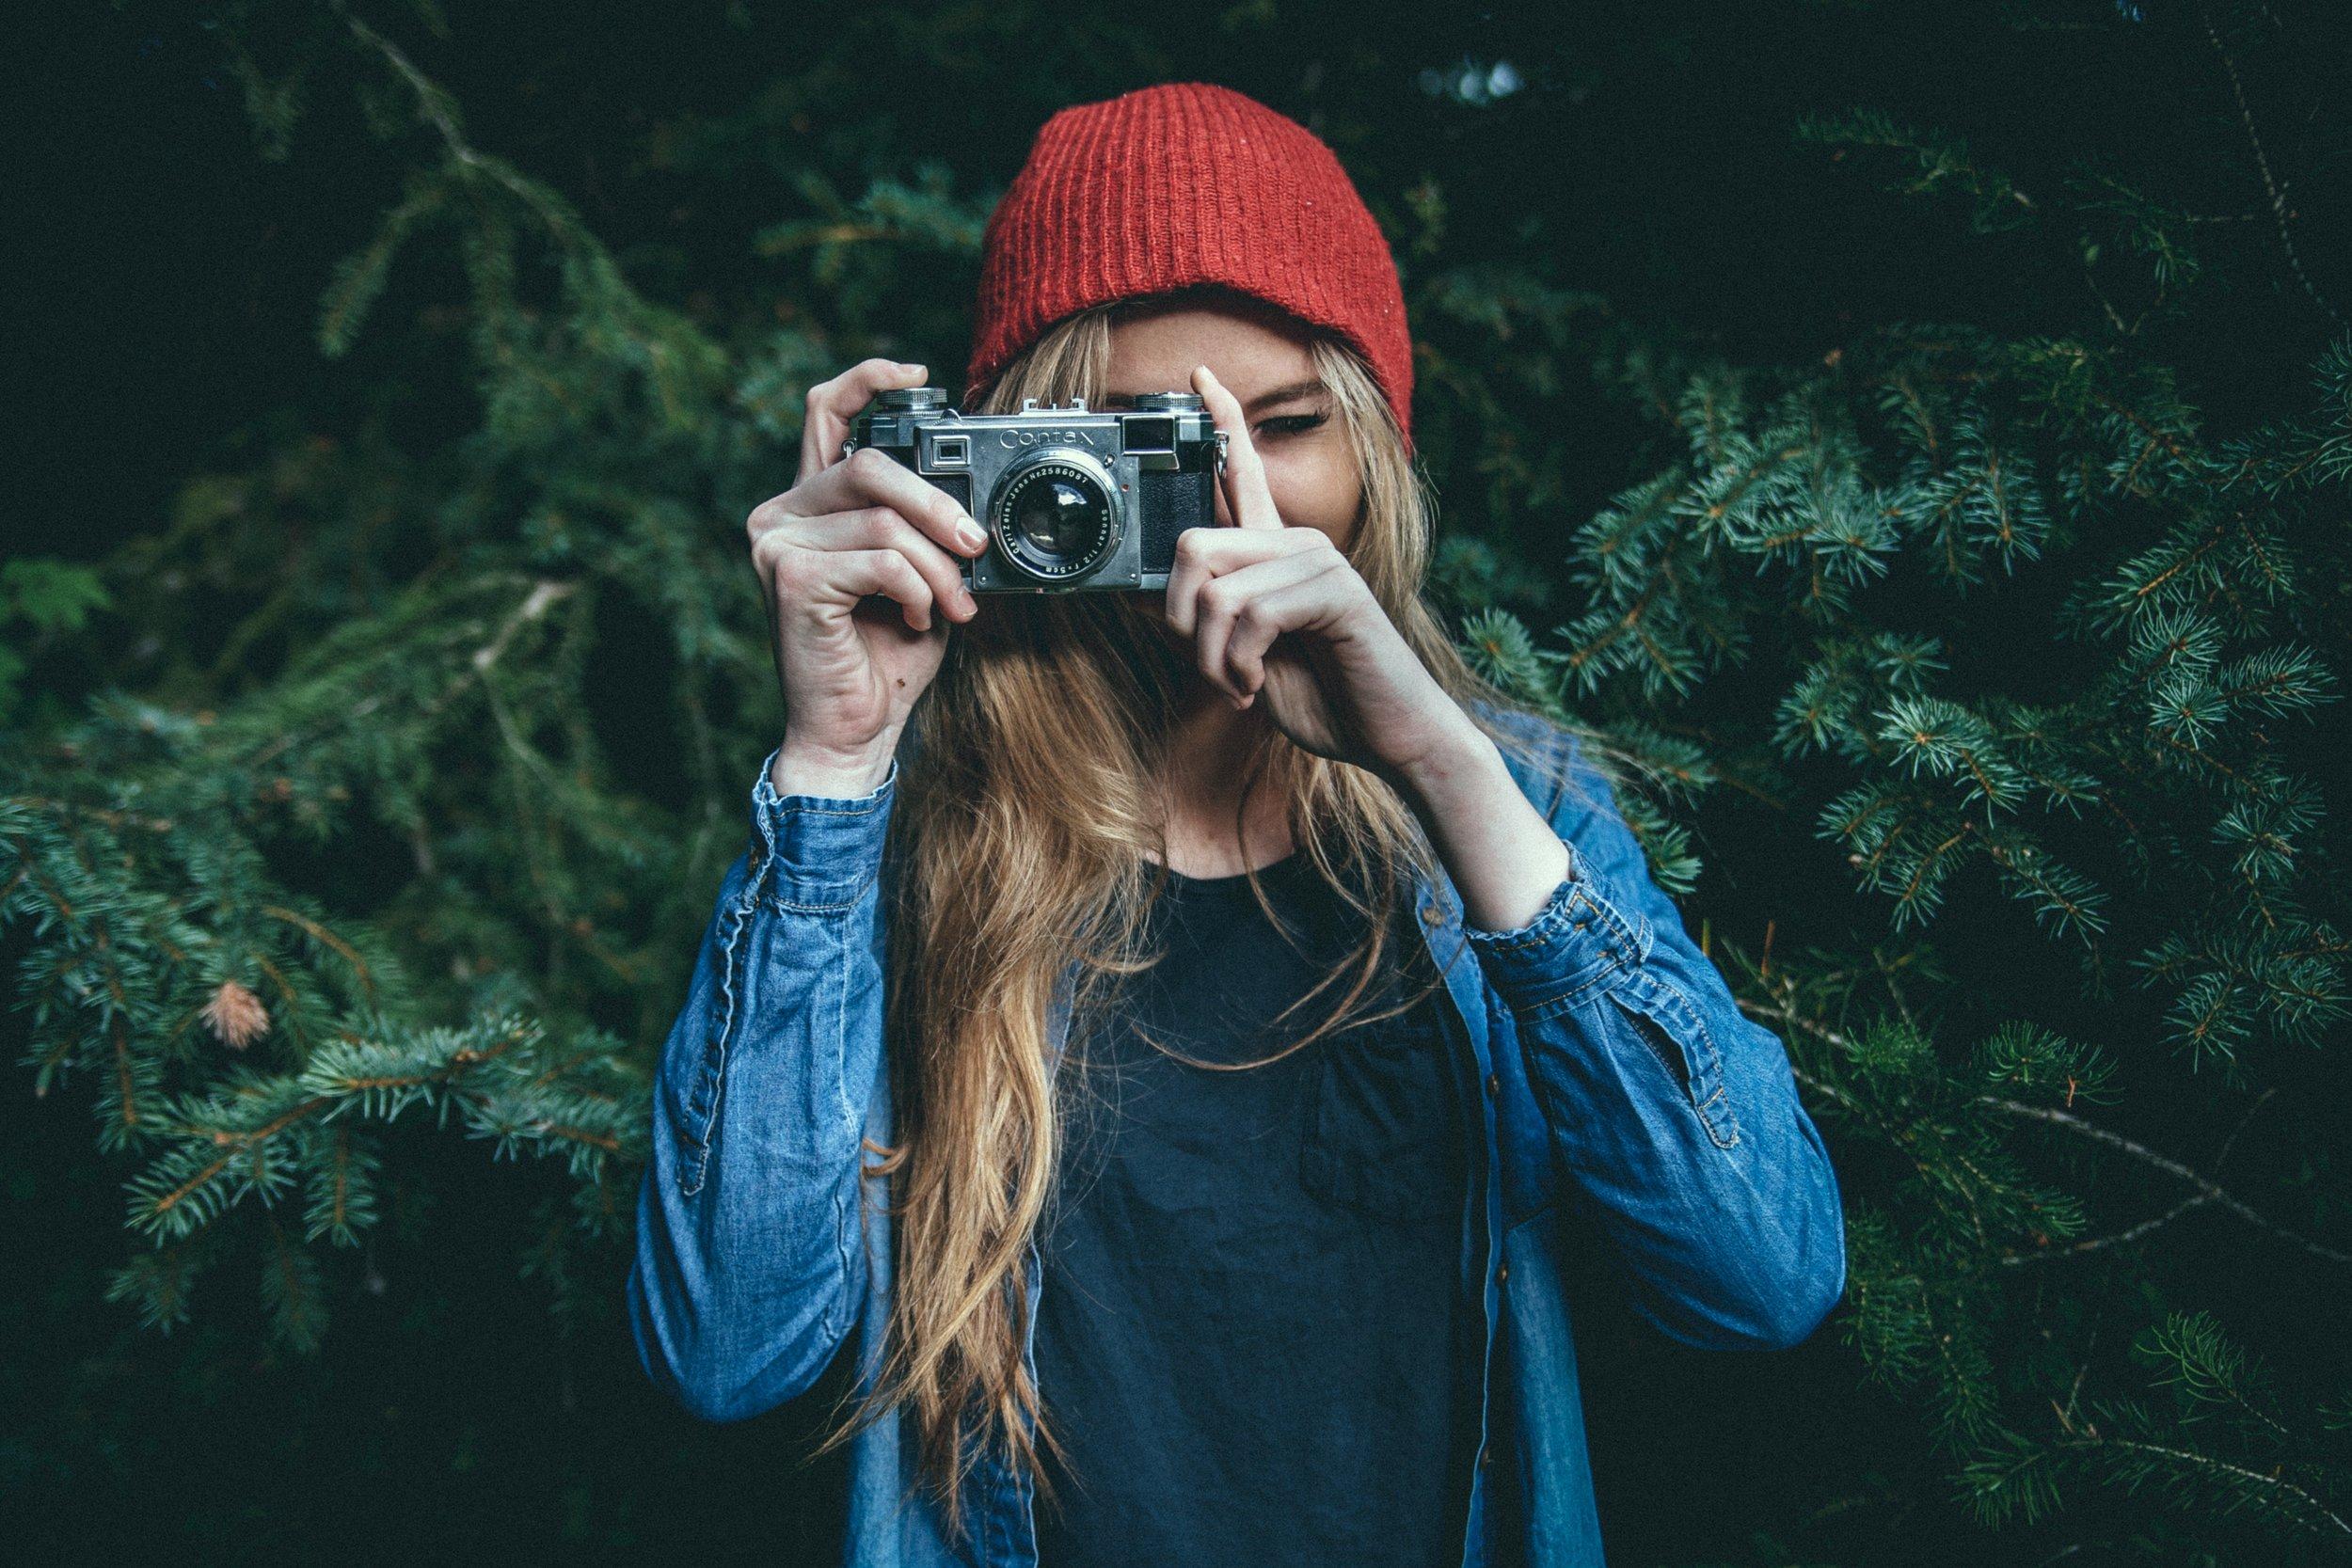 photography-class-lehigh-valley-pa.jpg